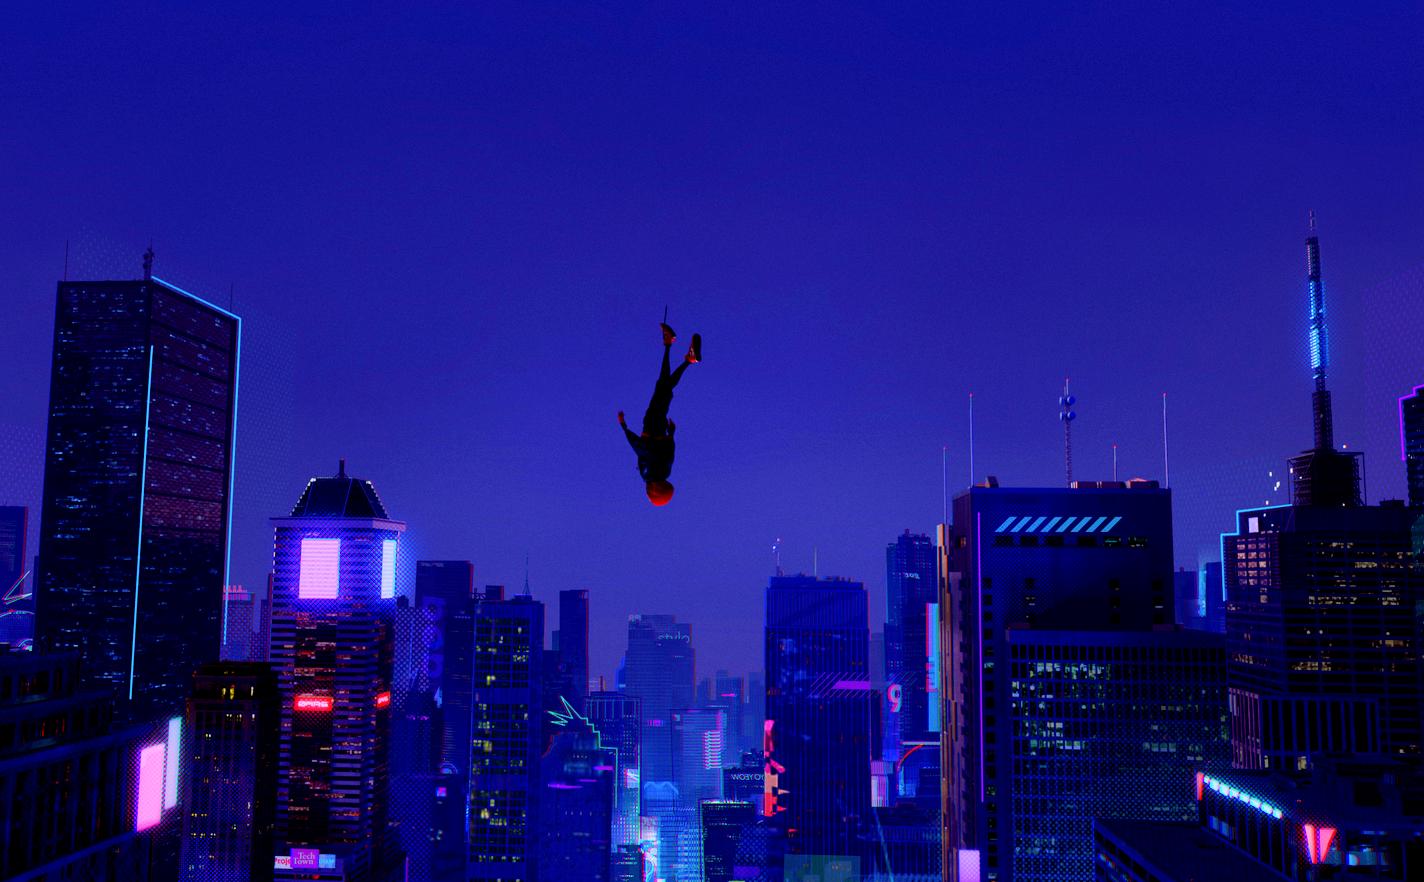 (1280 x 720)Spider-Verse Leap Of Faith